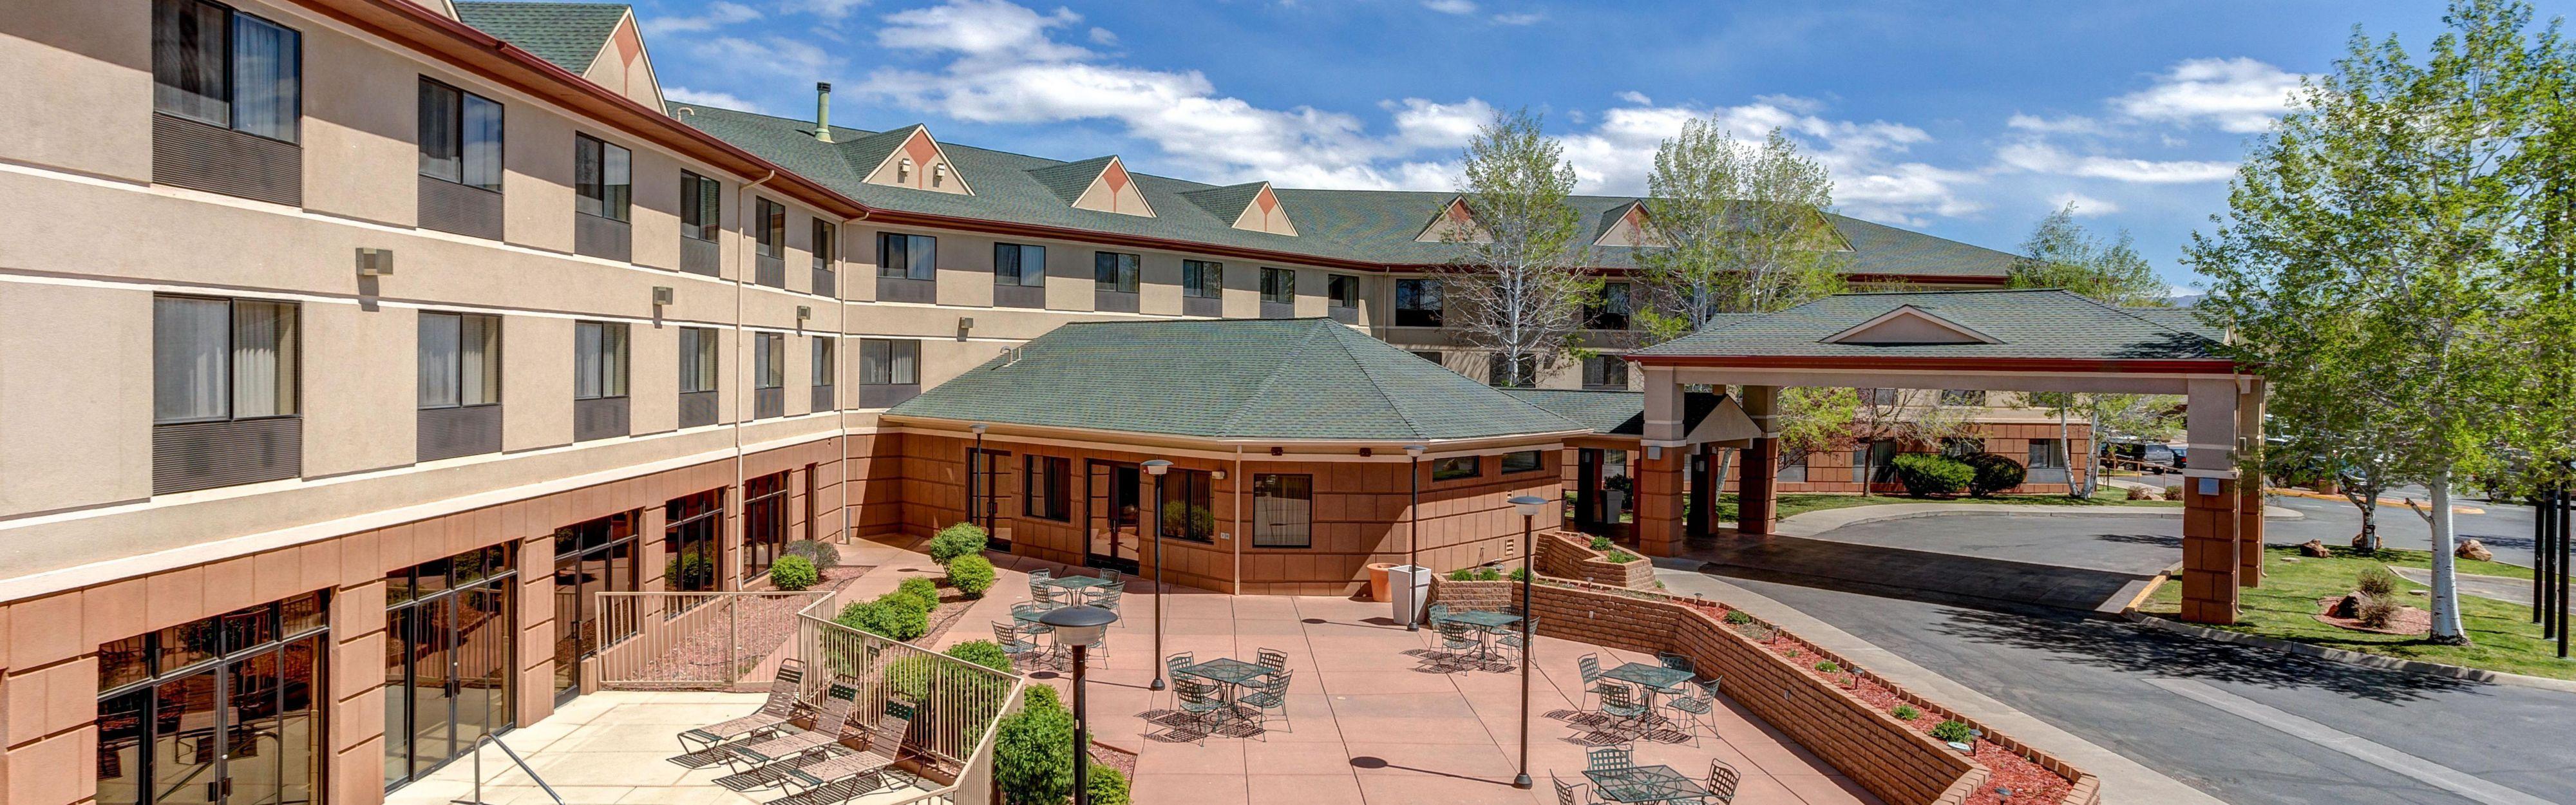 Holiday Inn Express & Suites Montrose image 0